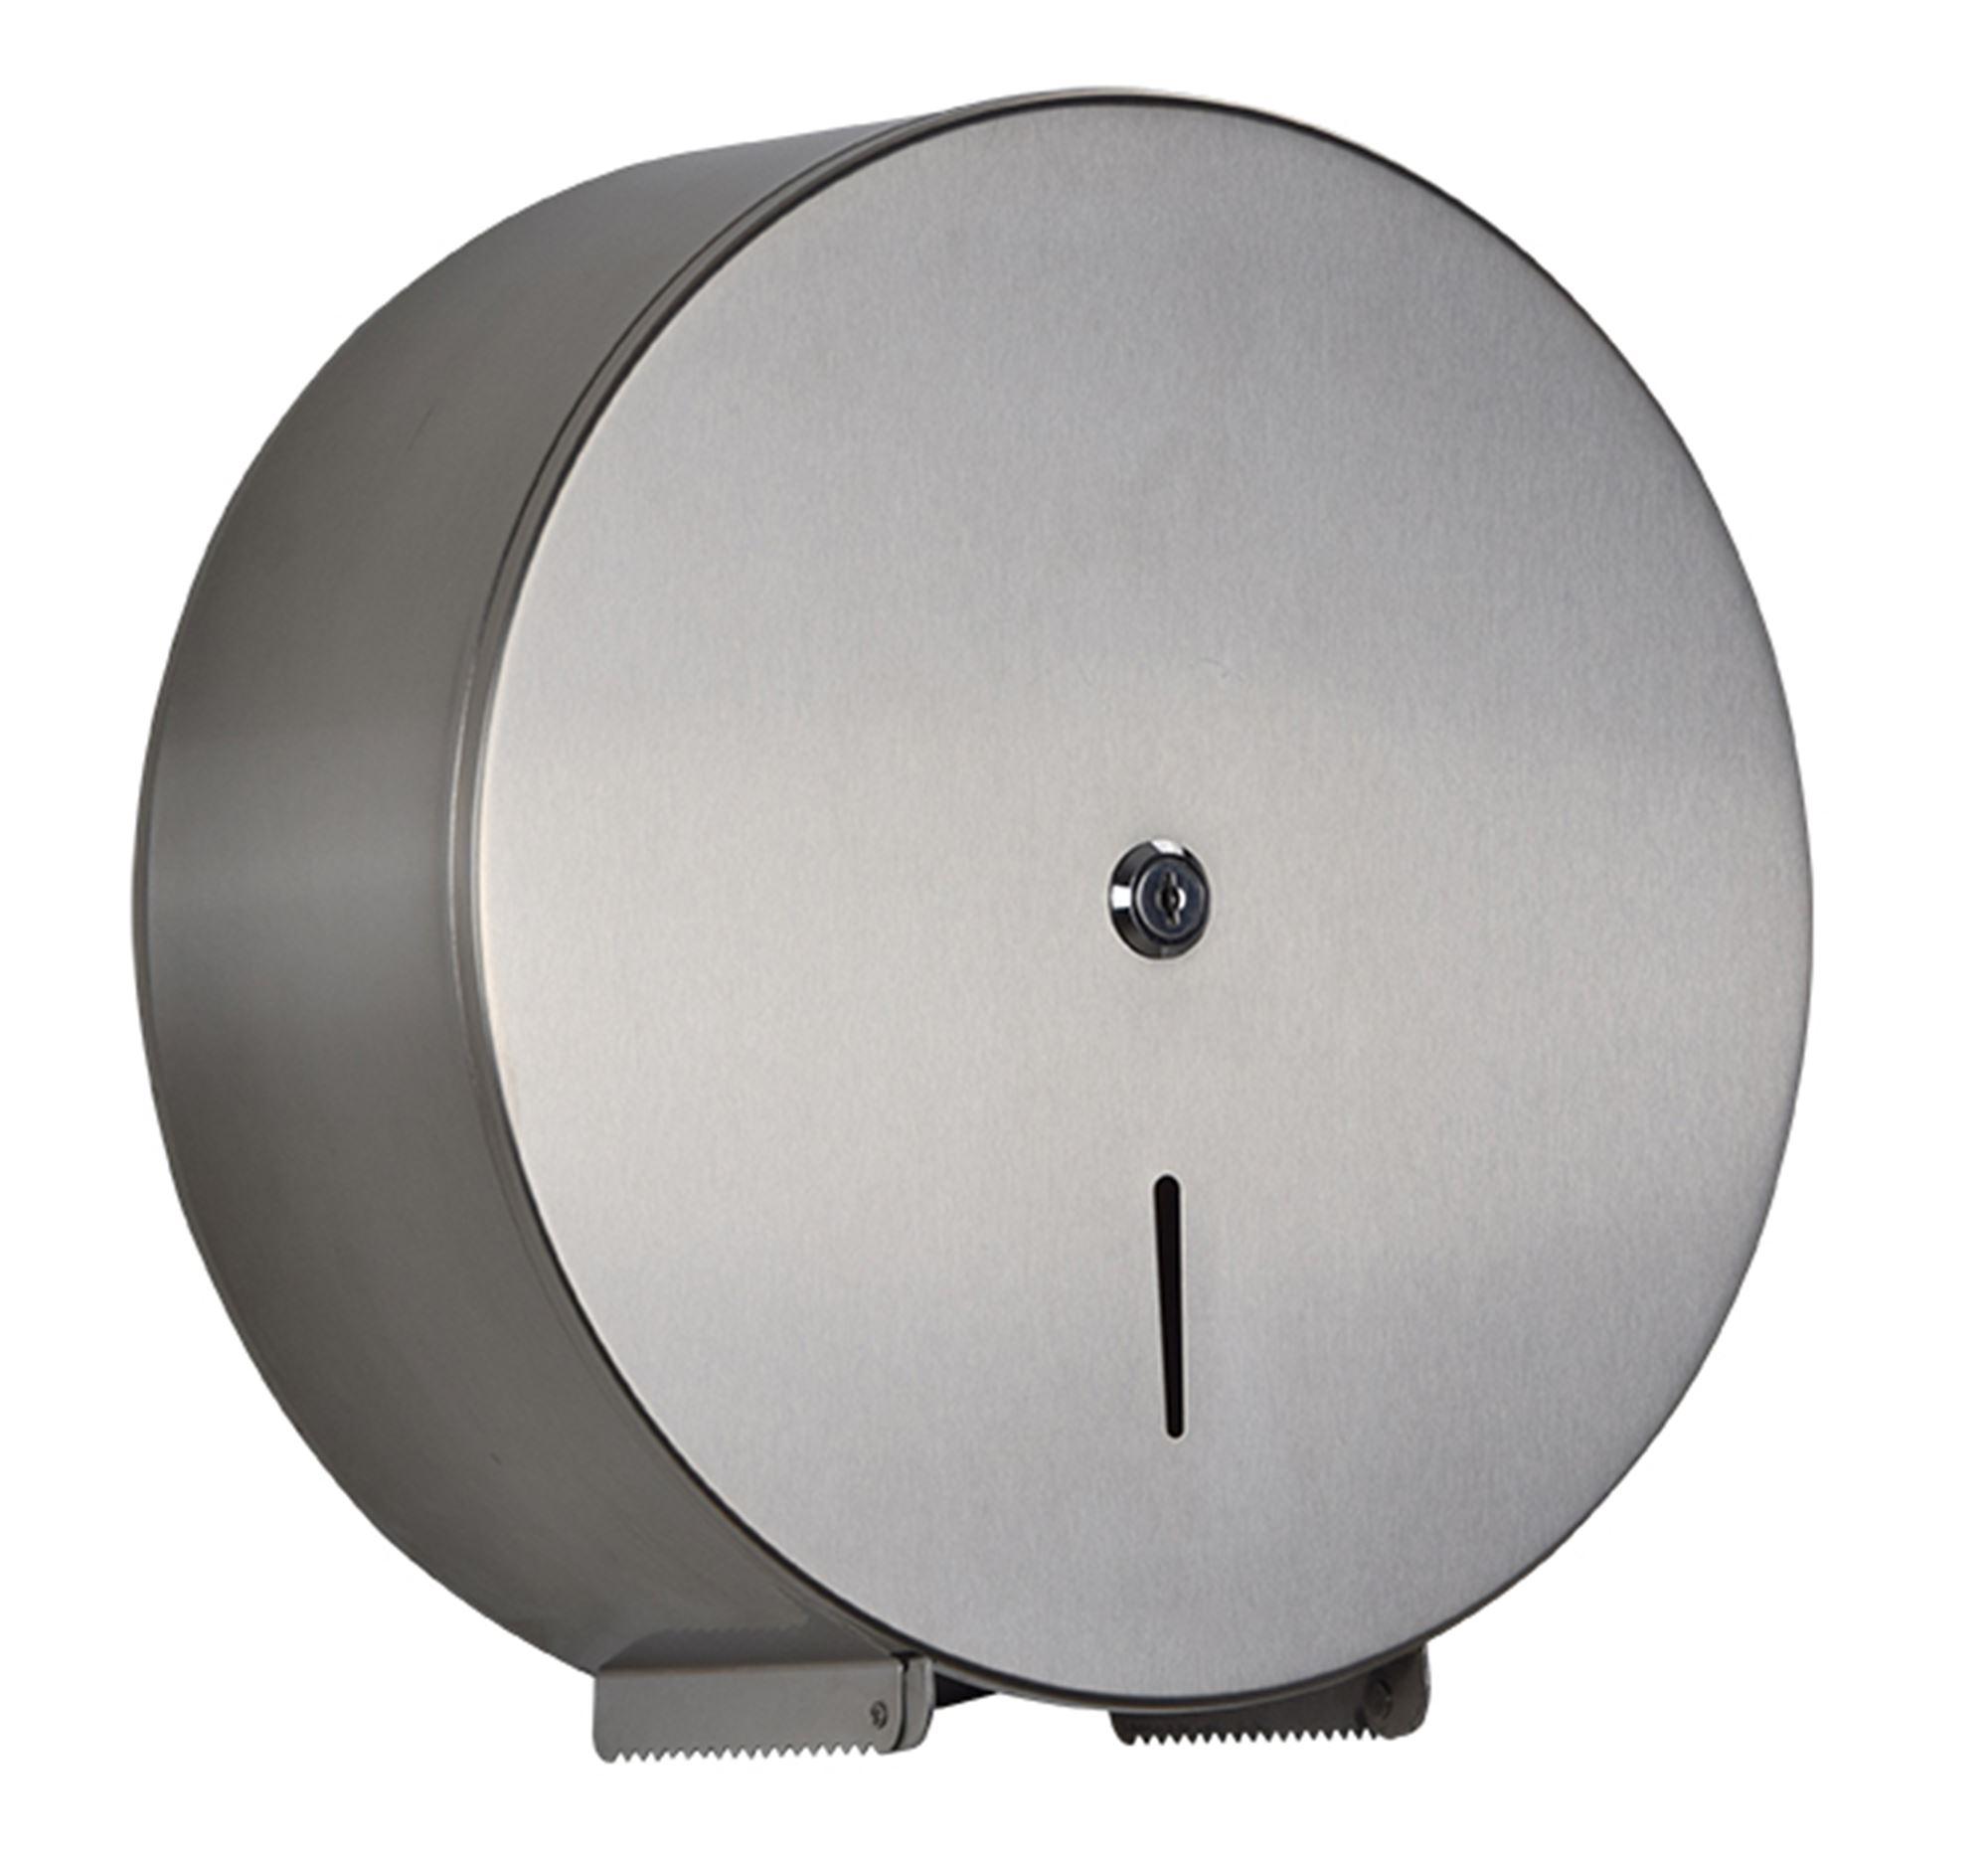 distributeur papier toilette rossignol 200m inox bross. Black Bedroom Furniture Sets. Home Design Ideas